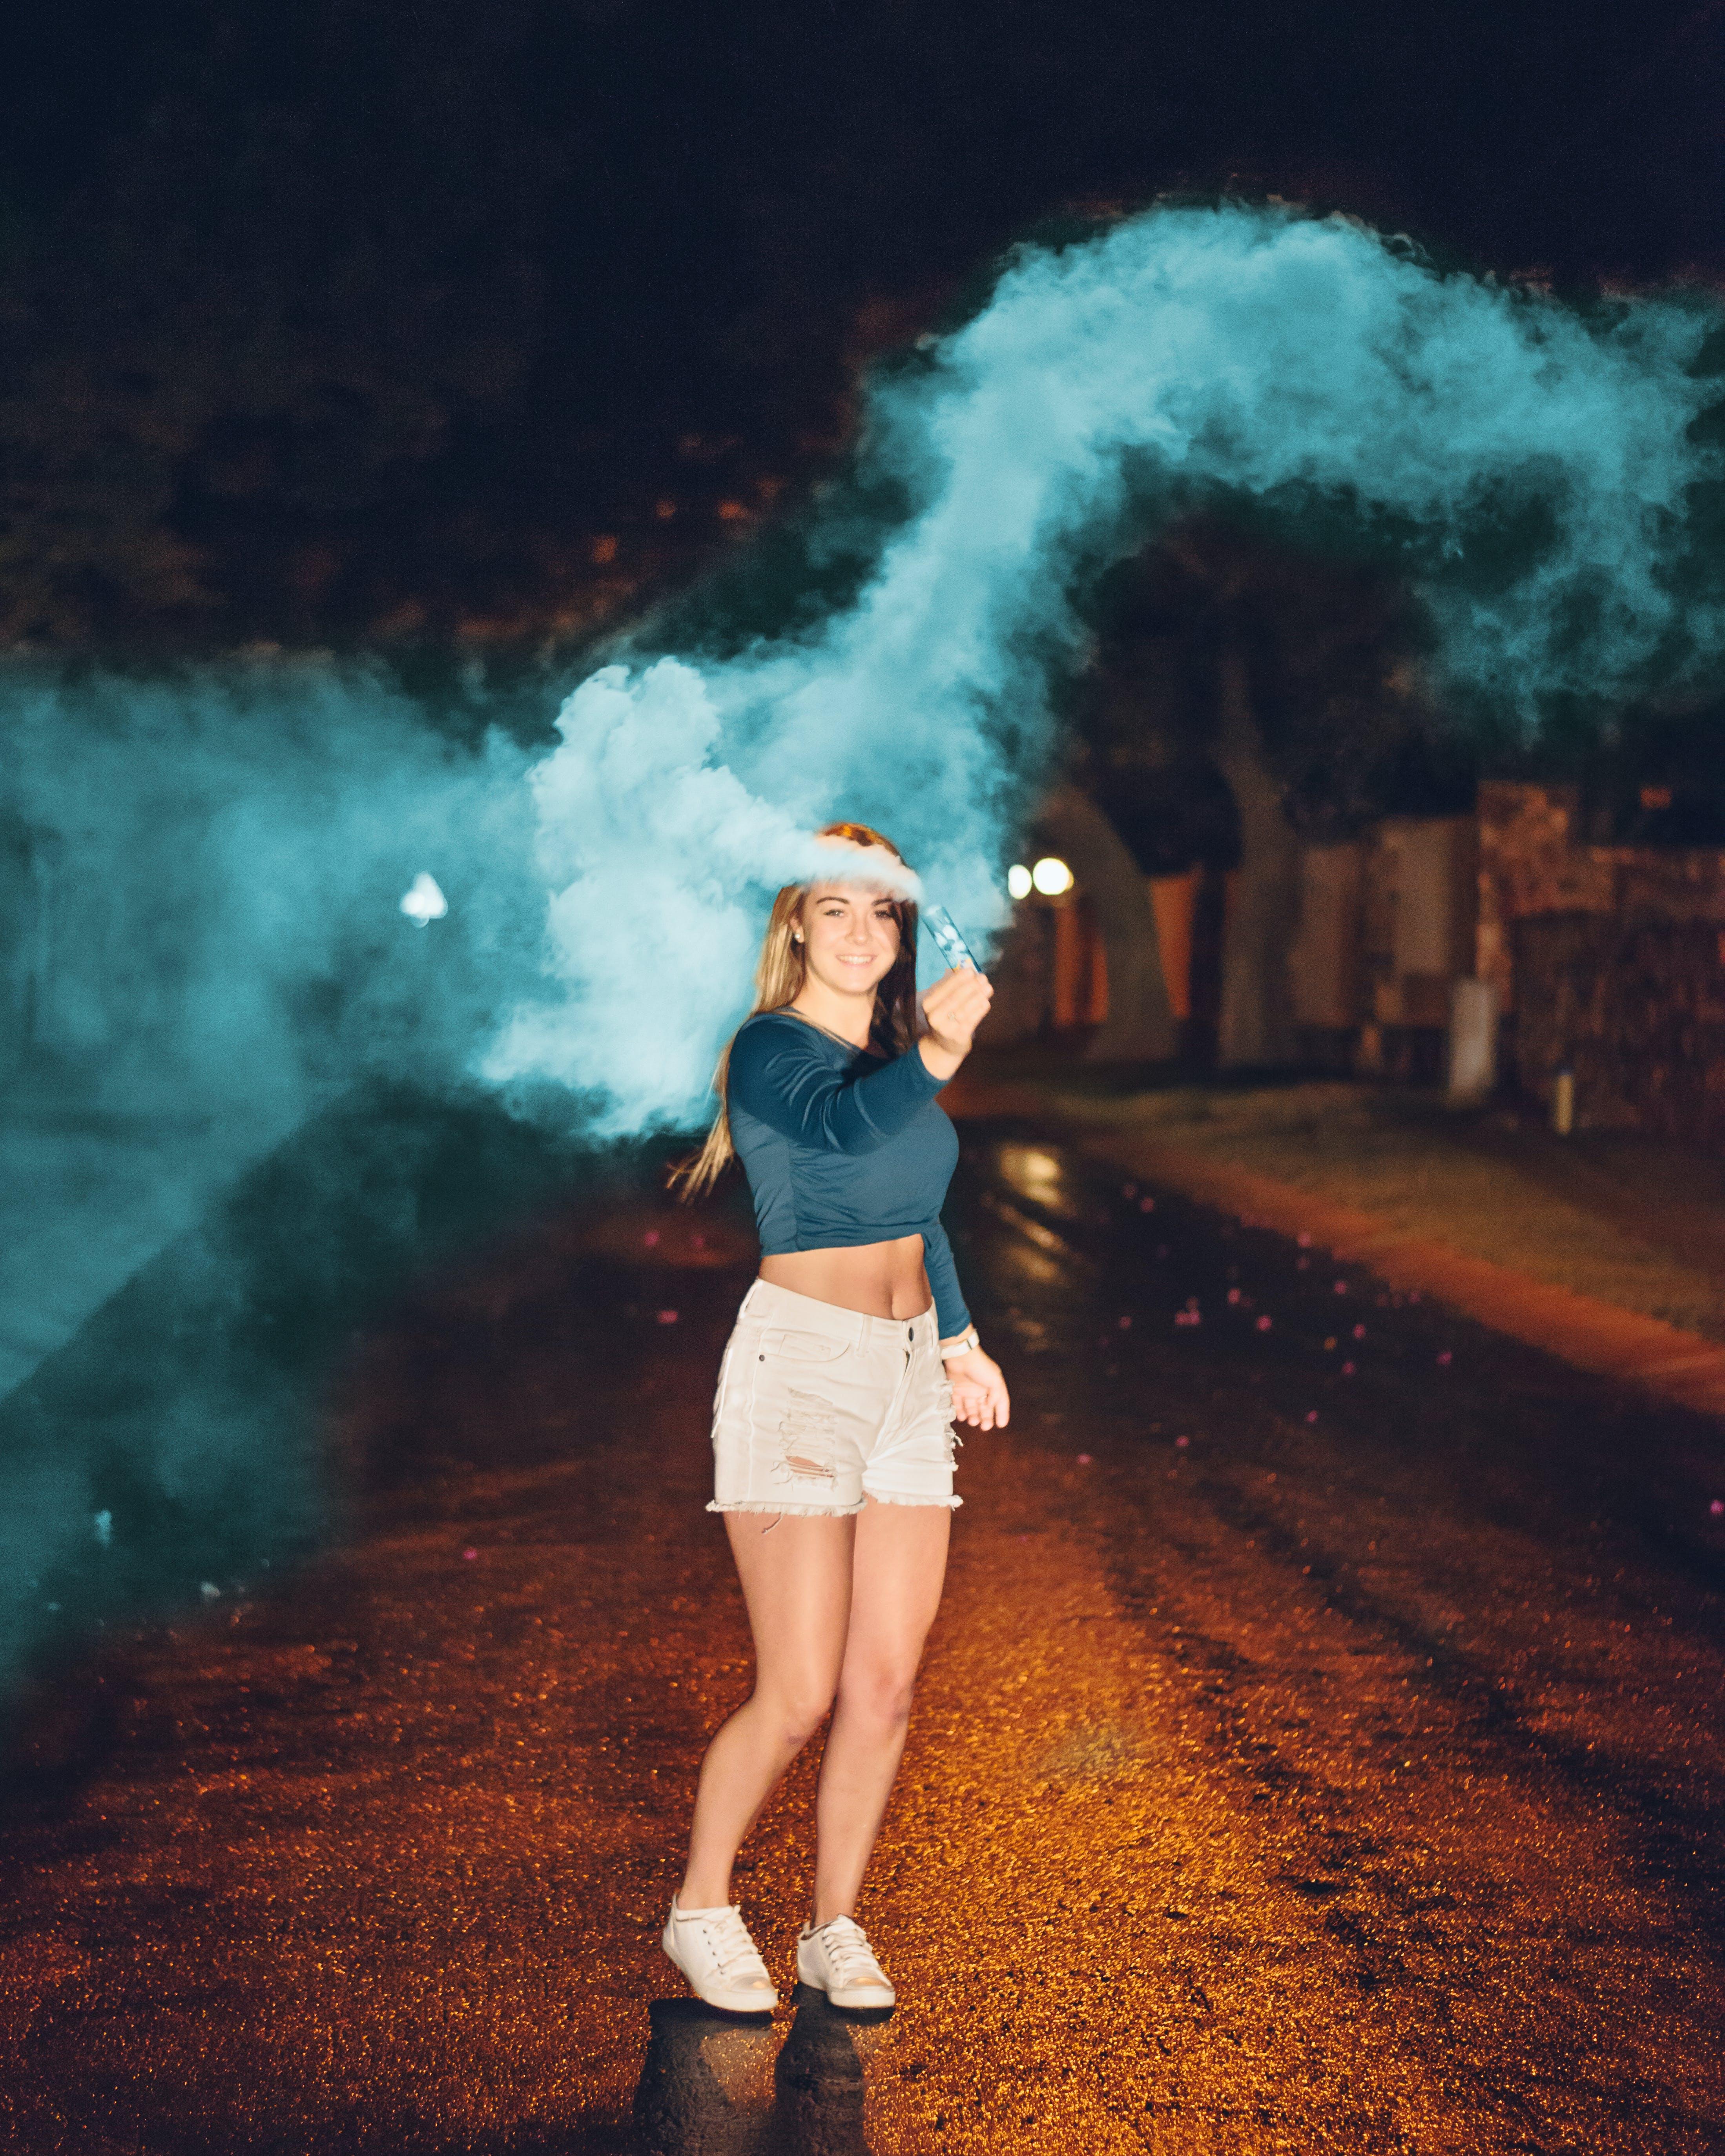 Photo of Woman Holding a Smoke Bomb